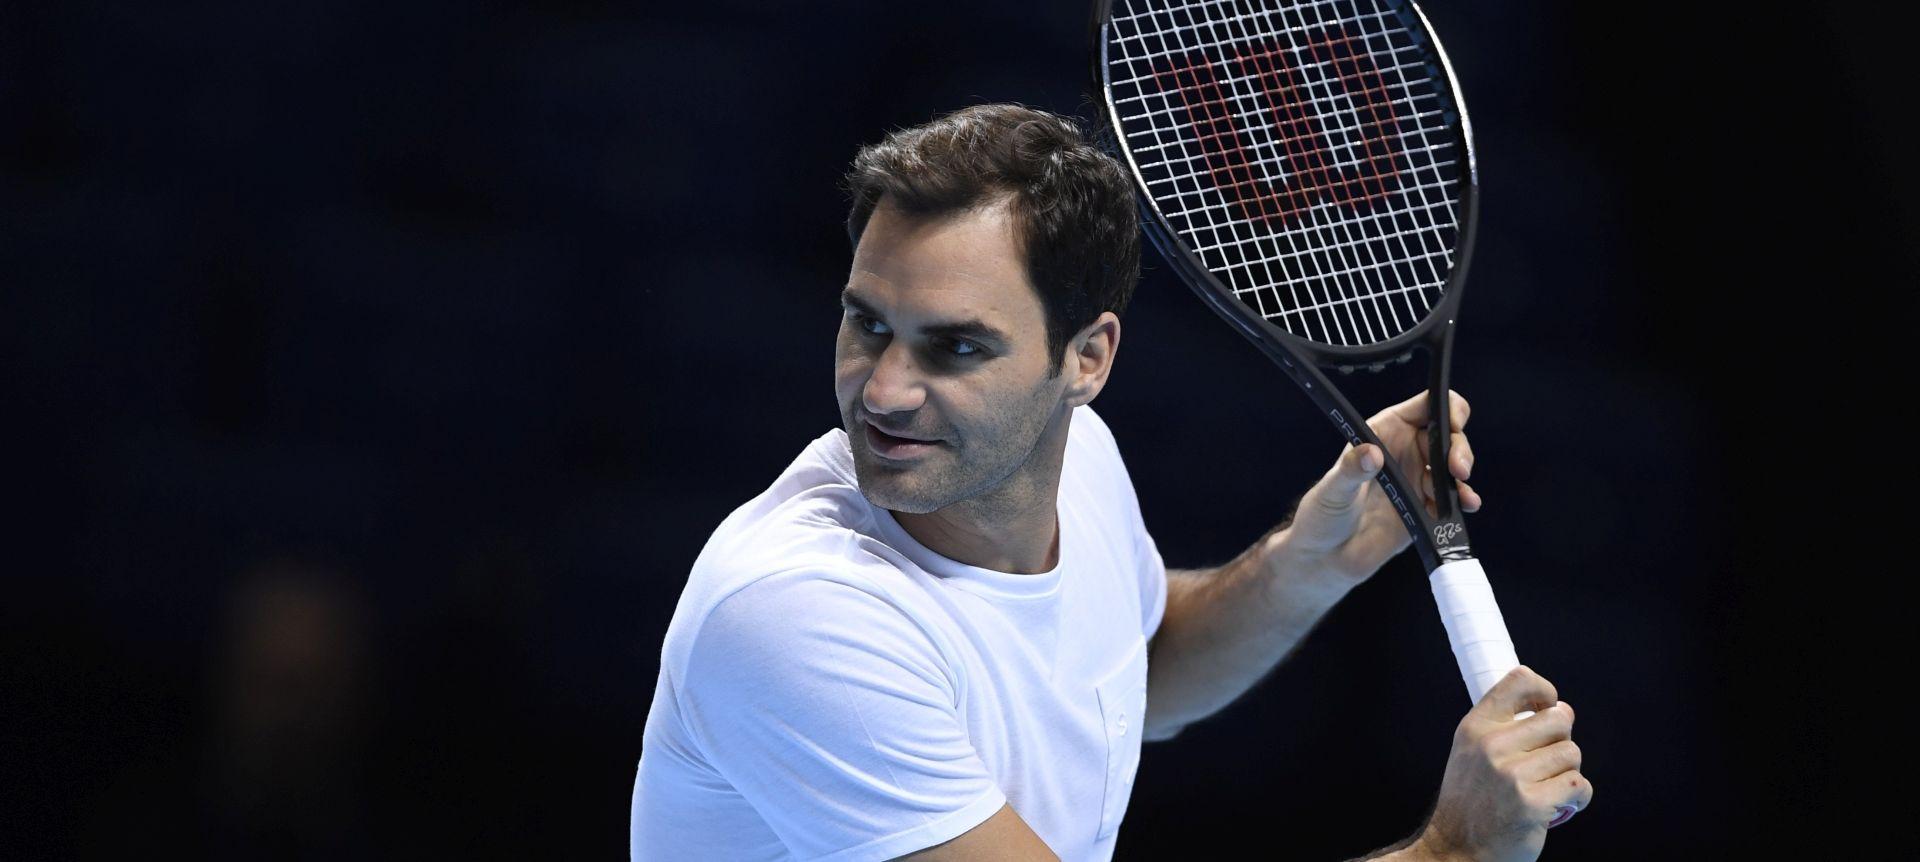 Hopman Cup: Švicarska i Federer opet najbolji nakon 17 godina